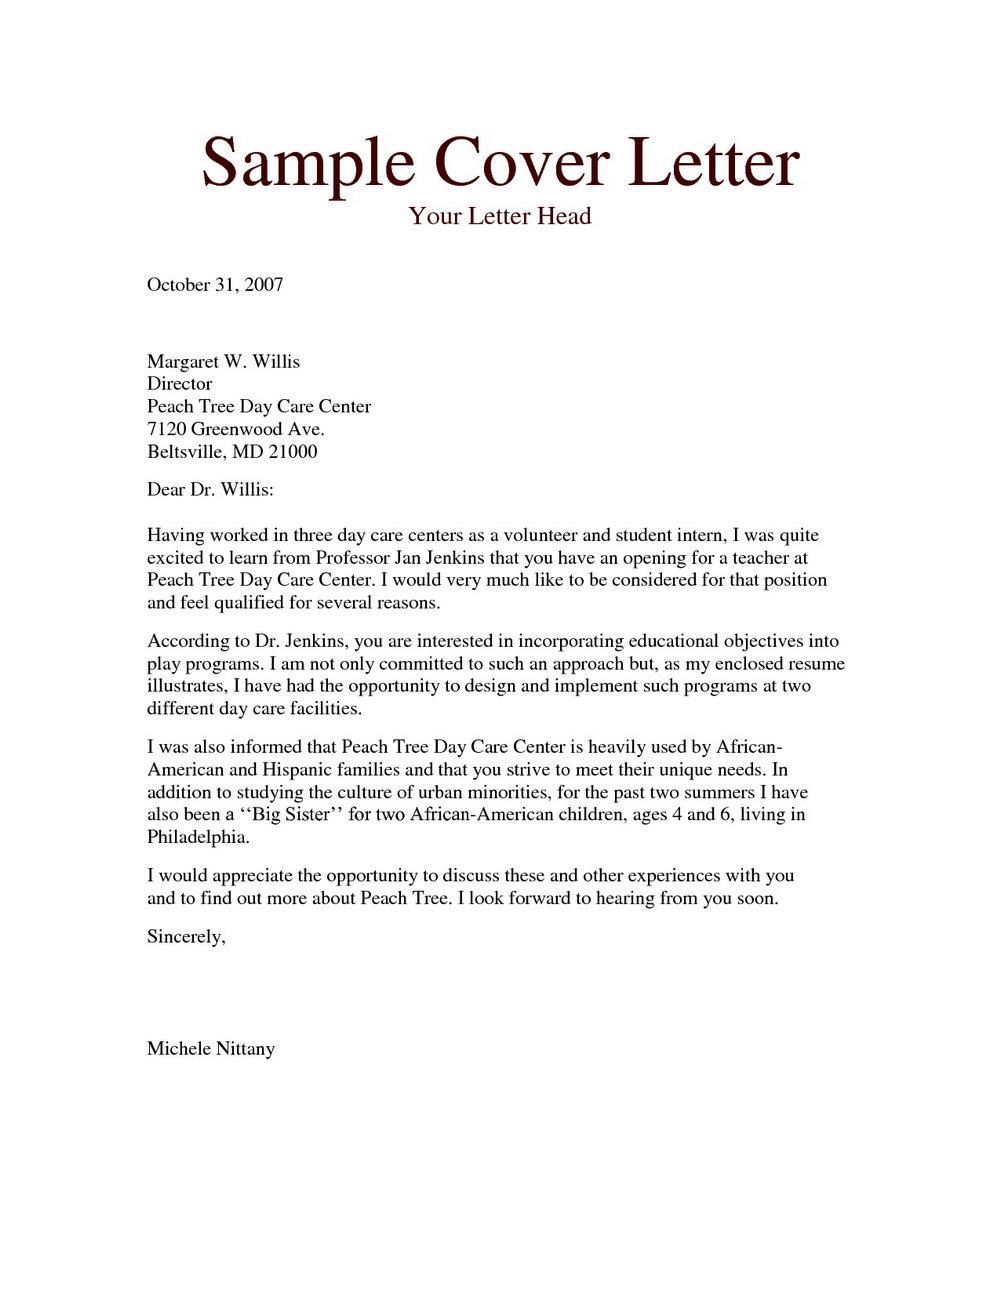 Sample Cover Letter For Child Care Teacher Assistant